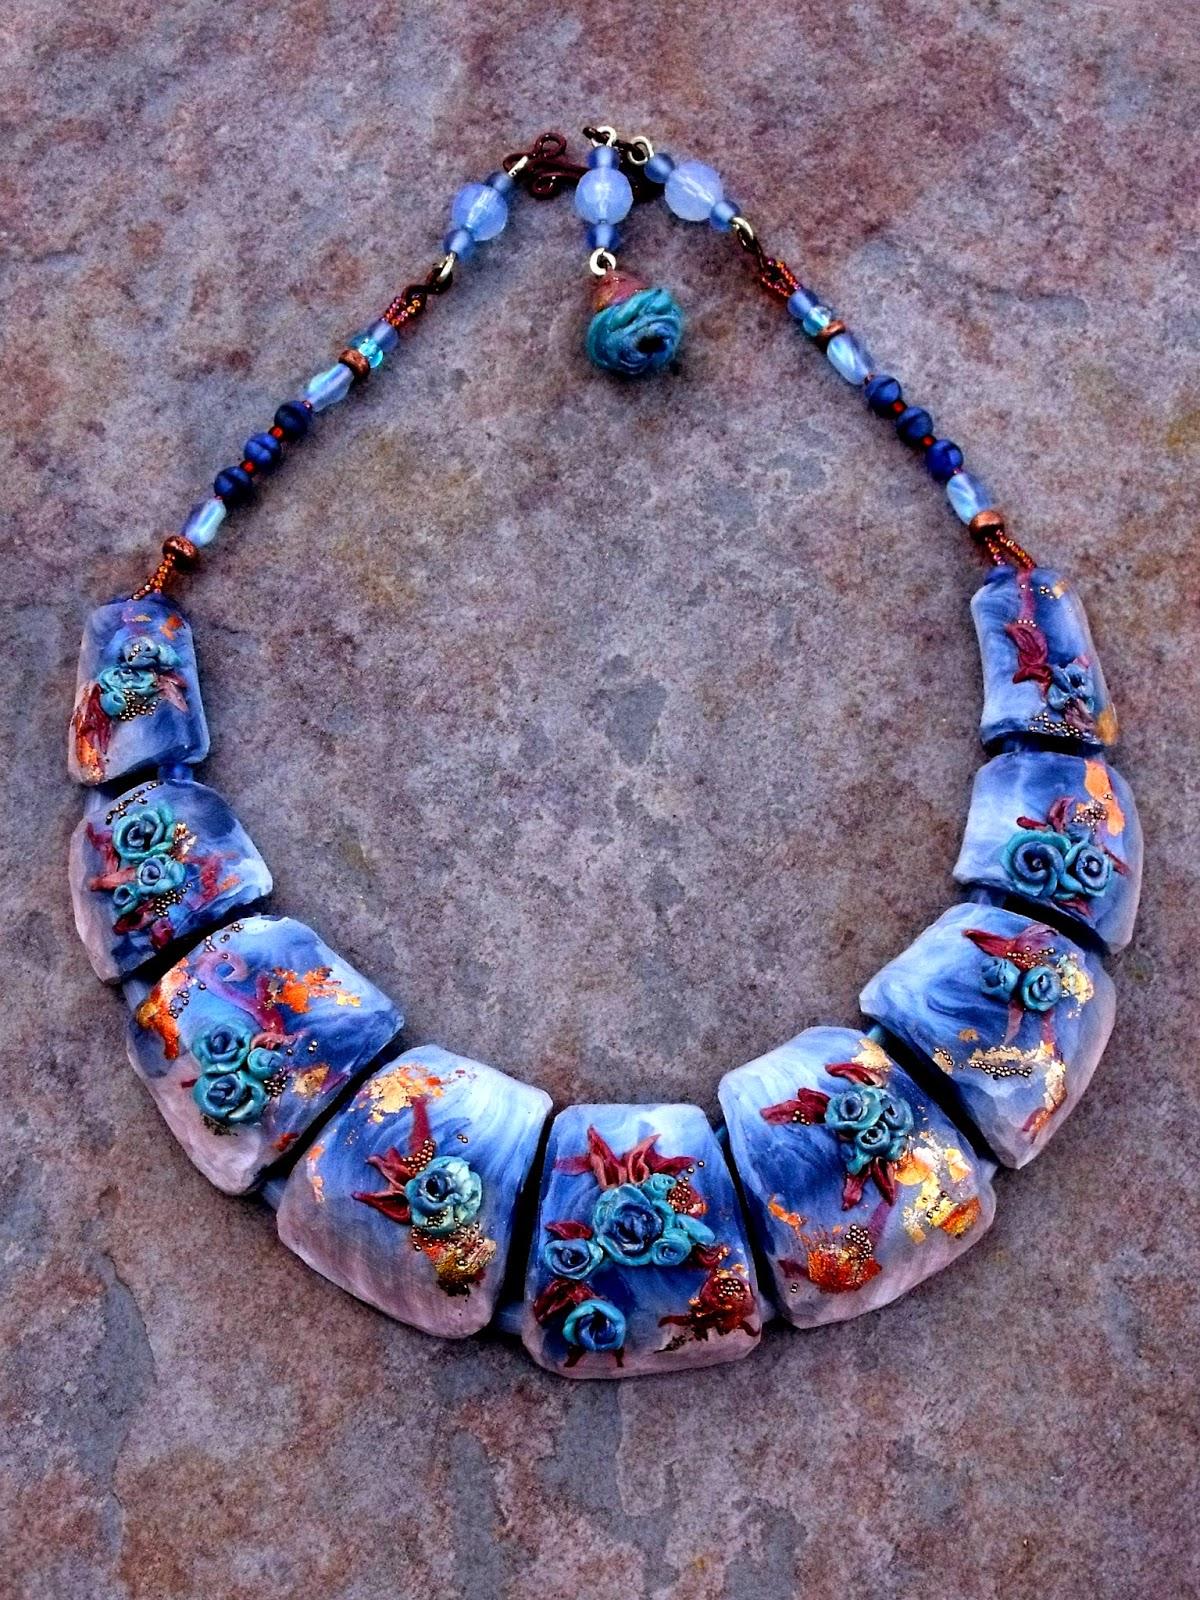 Palumbo Jewelry And Mosaics Art Bead Scene Blog April Monthly Challenge